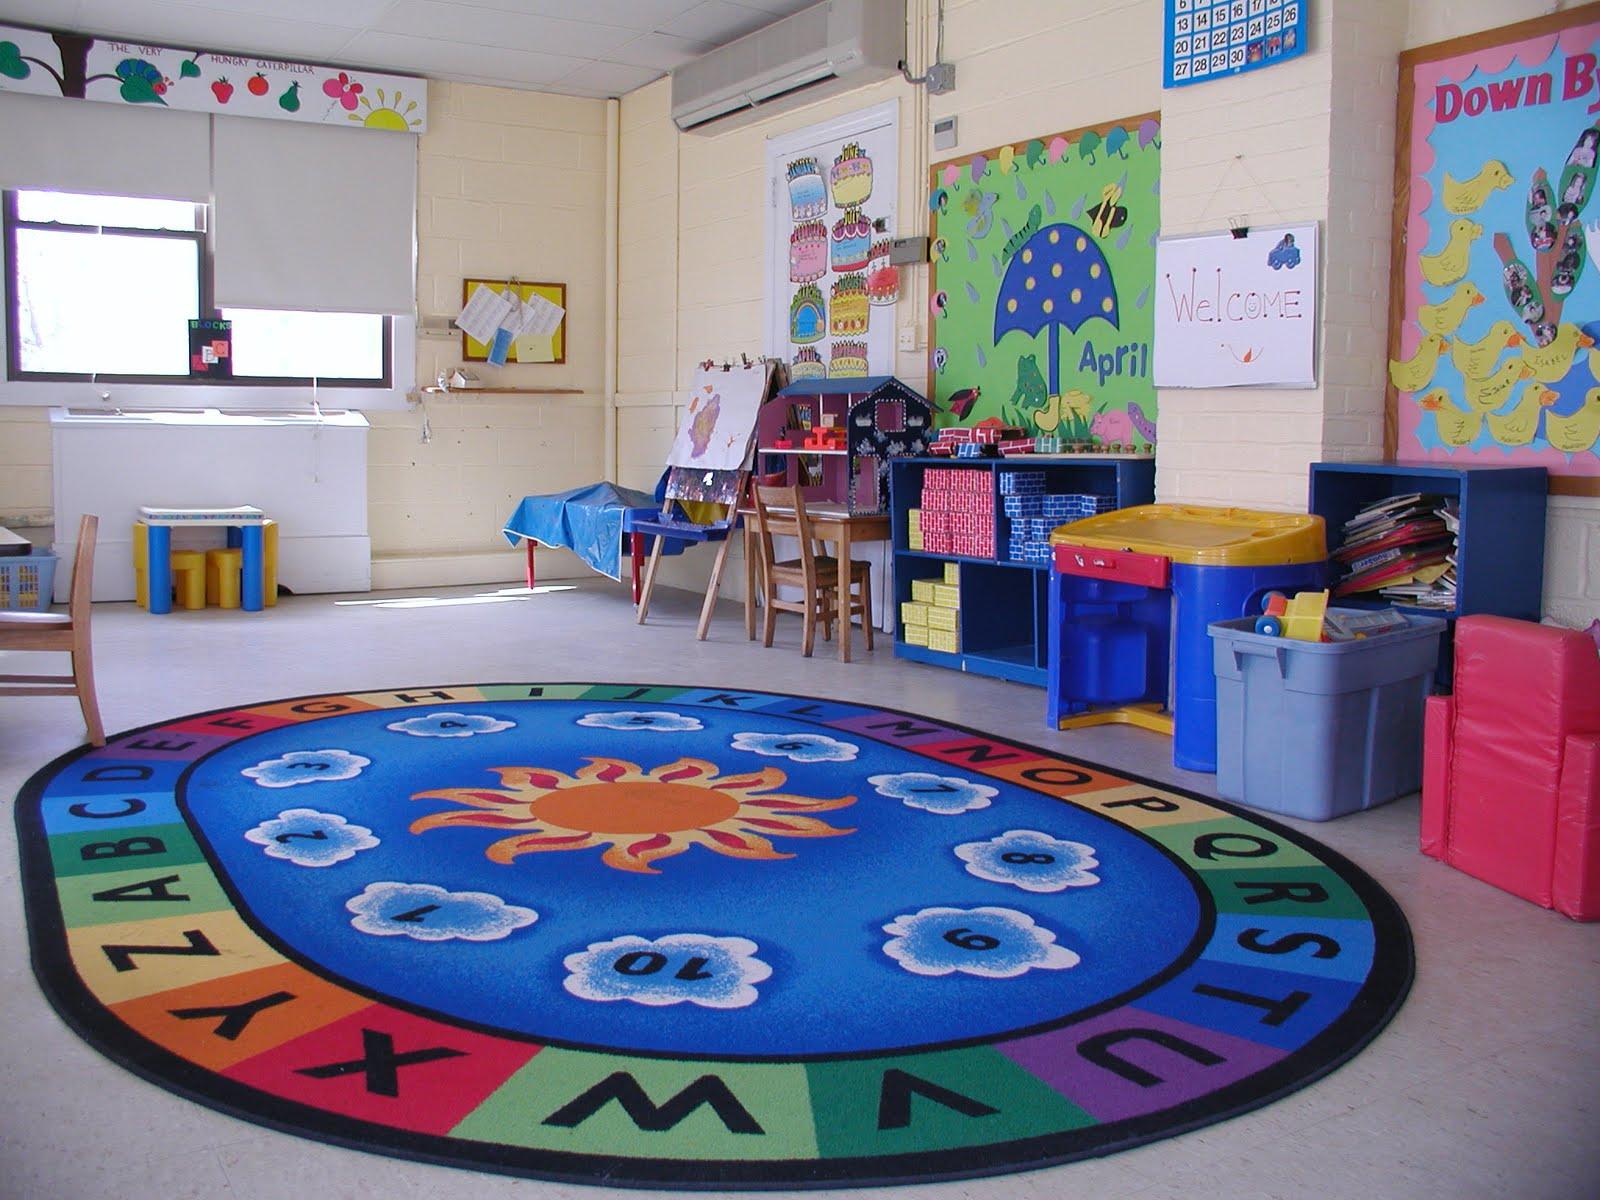 academic preschool san isidro integrated school april 2010 987